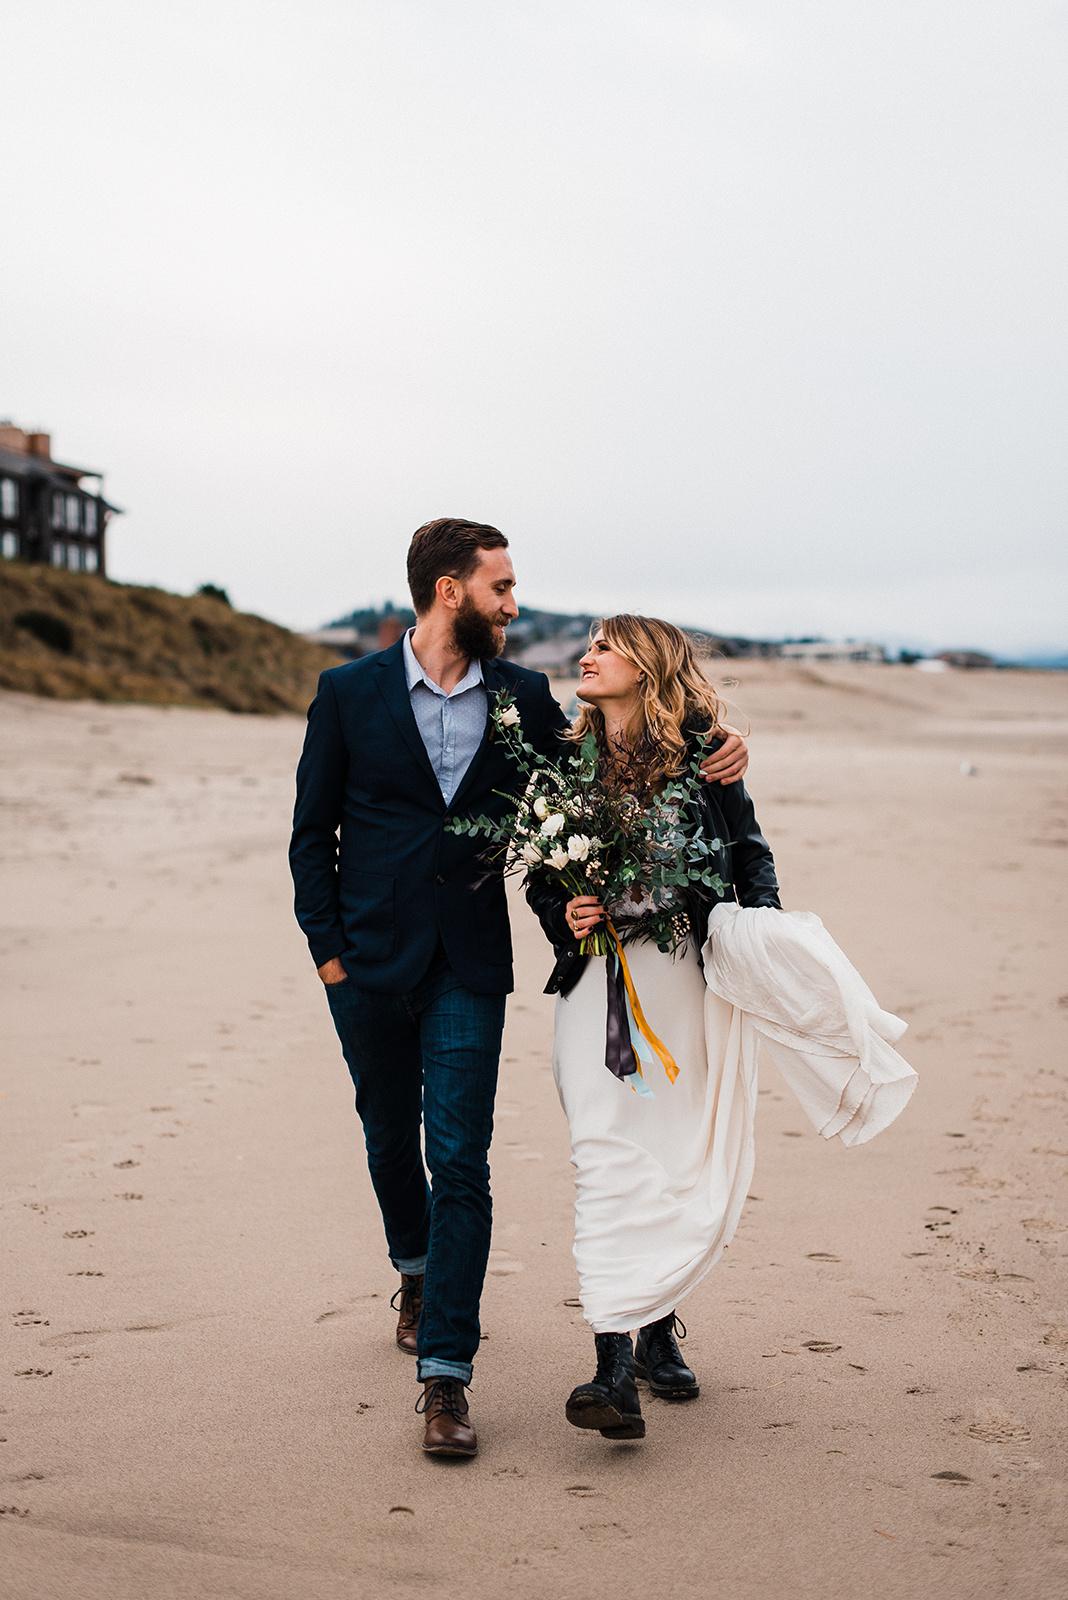 Oregon_Coast_Elopement_Wedding_The_Foxes_Photography_080.jpg